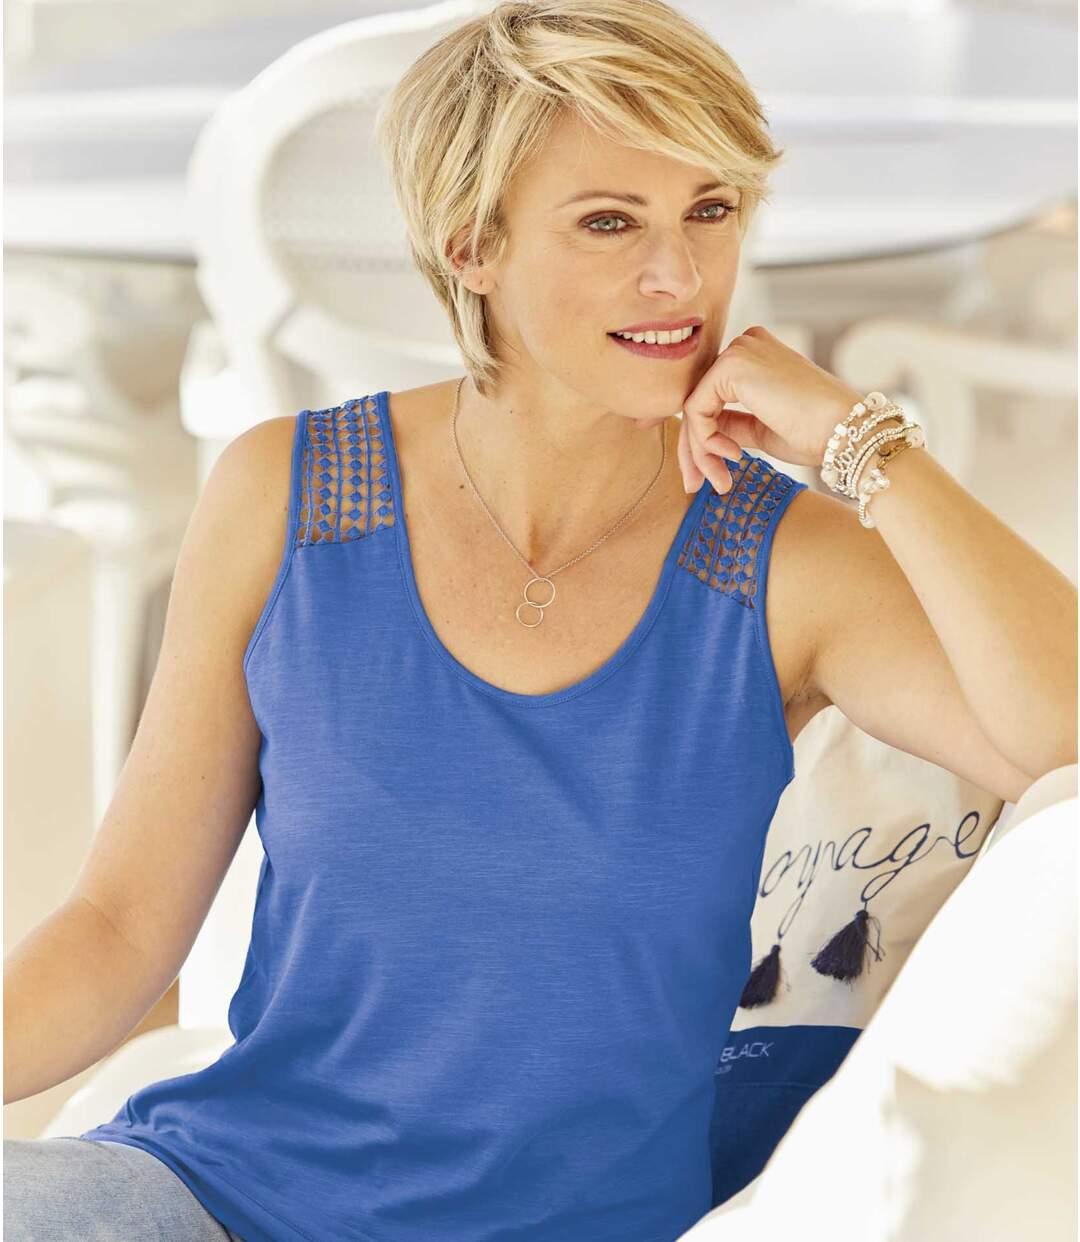 Pack of 2 Women's Macramé Vest Tops - Blue Off-White